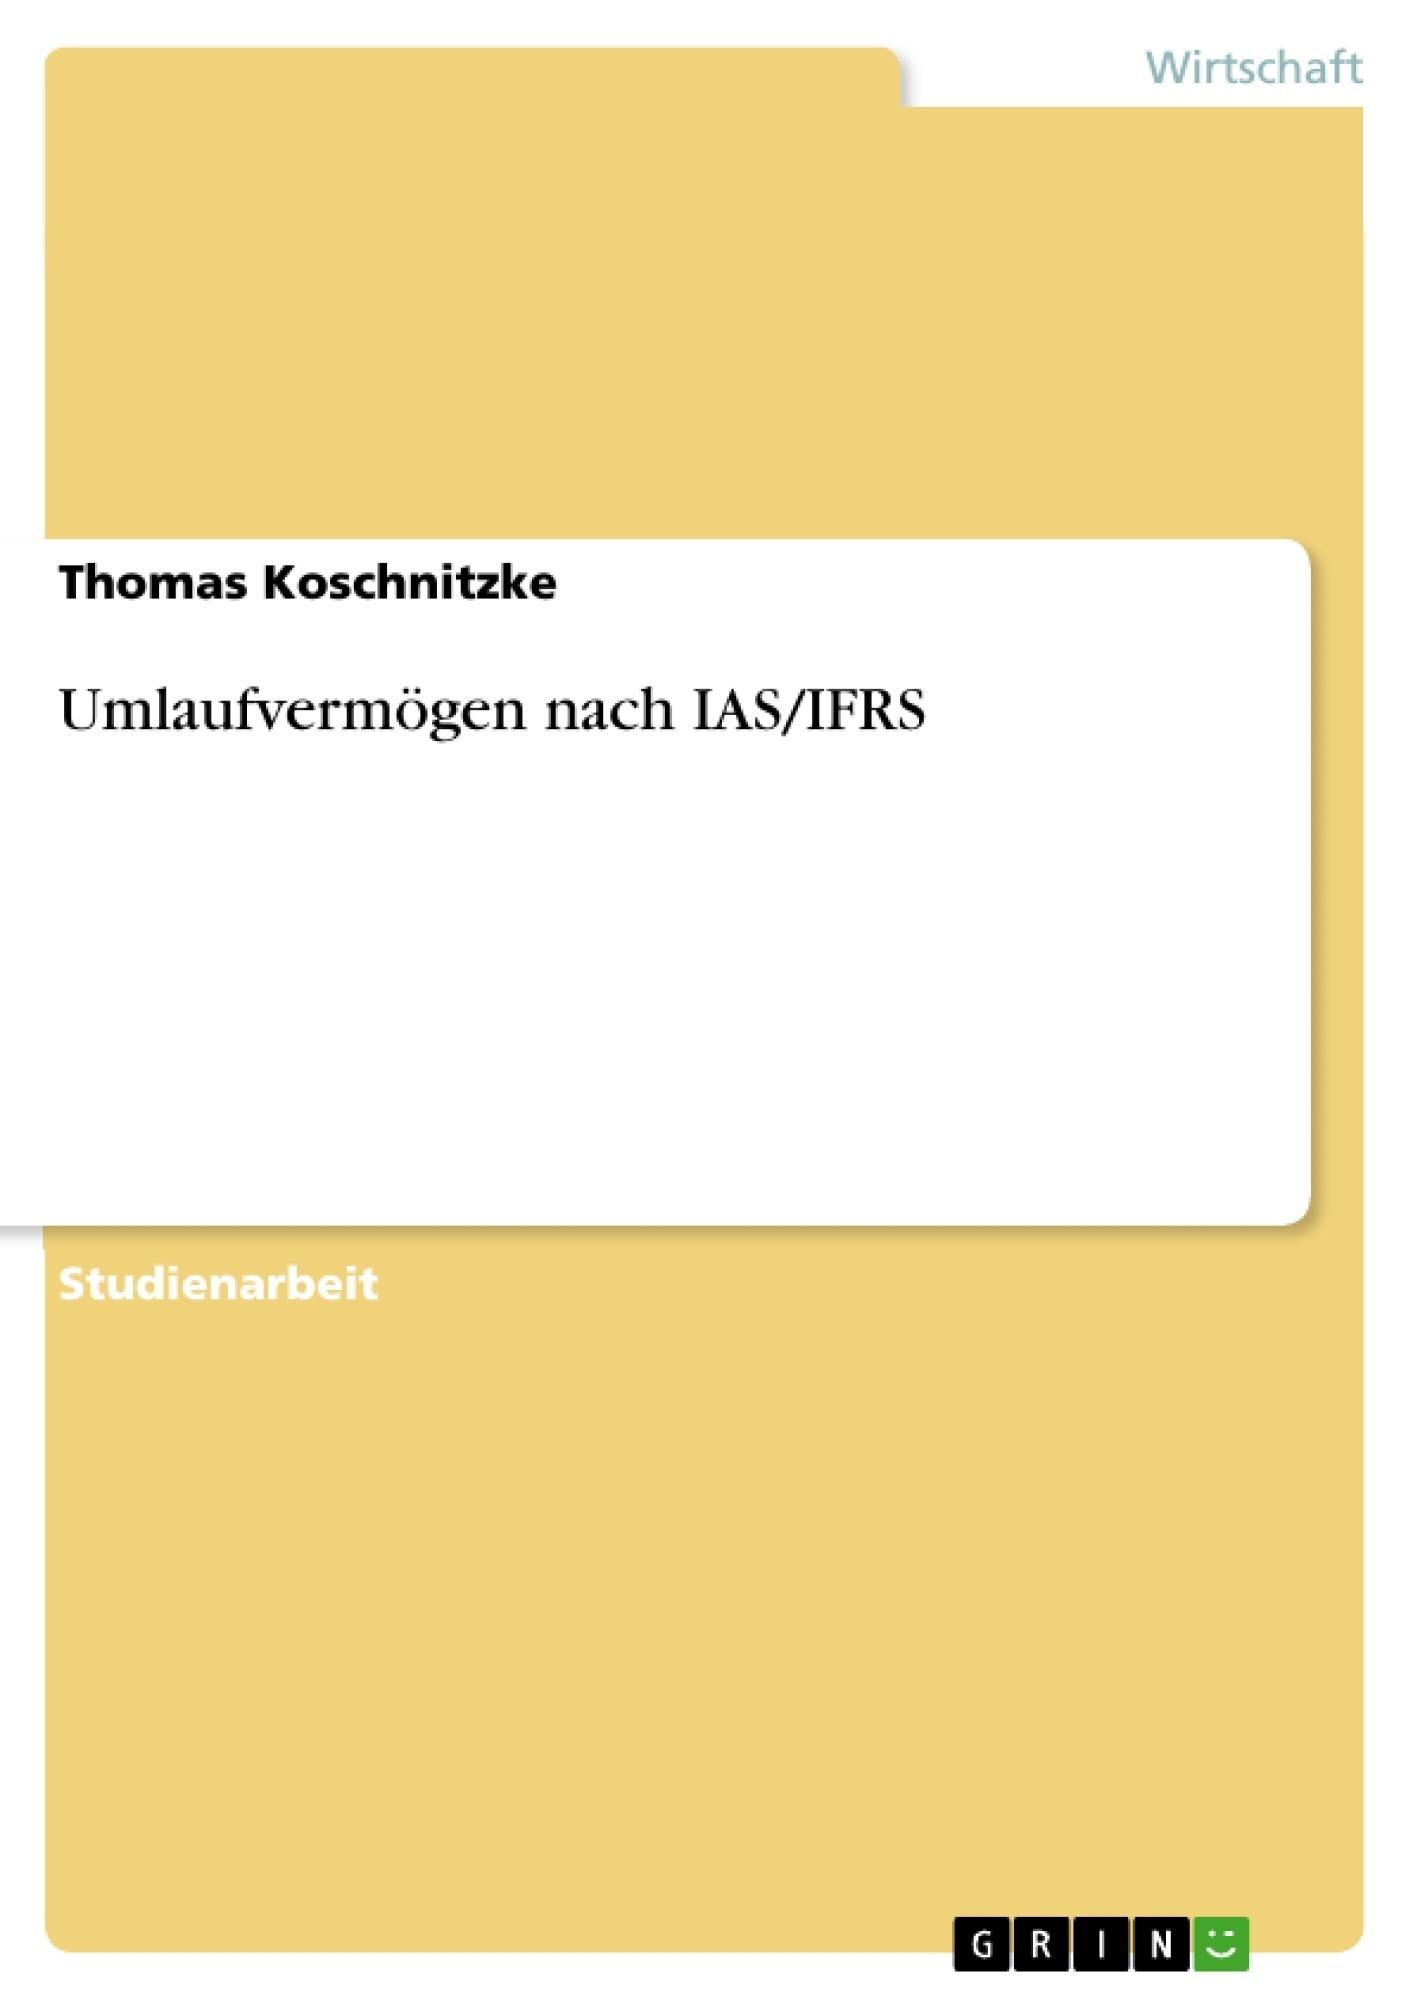 Titel: Umlaufvermögen nach IAS/IFRS